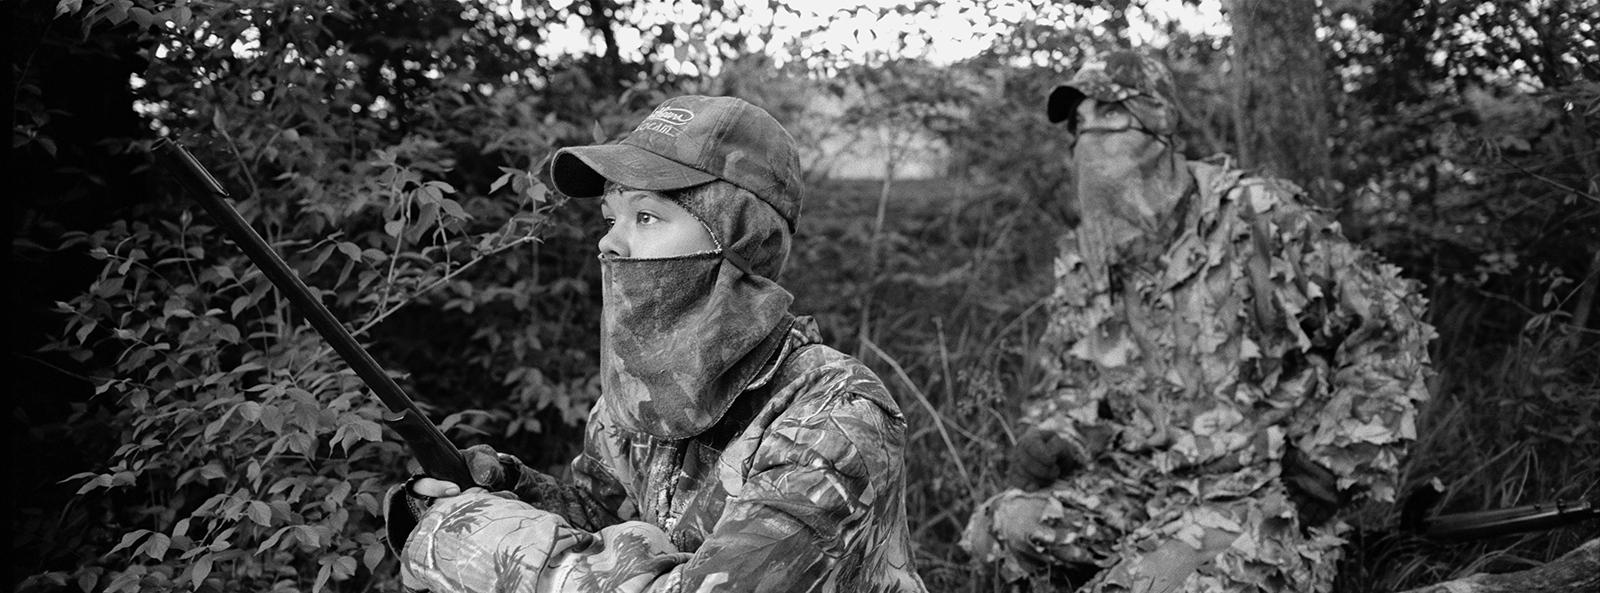 John and Samantha Svoboda hunting turkey Archival digital print 24 x 10 2011